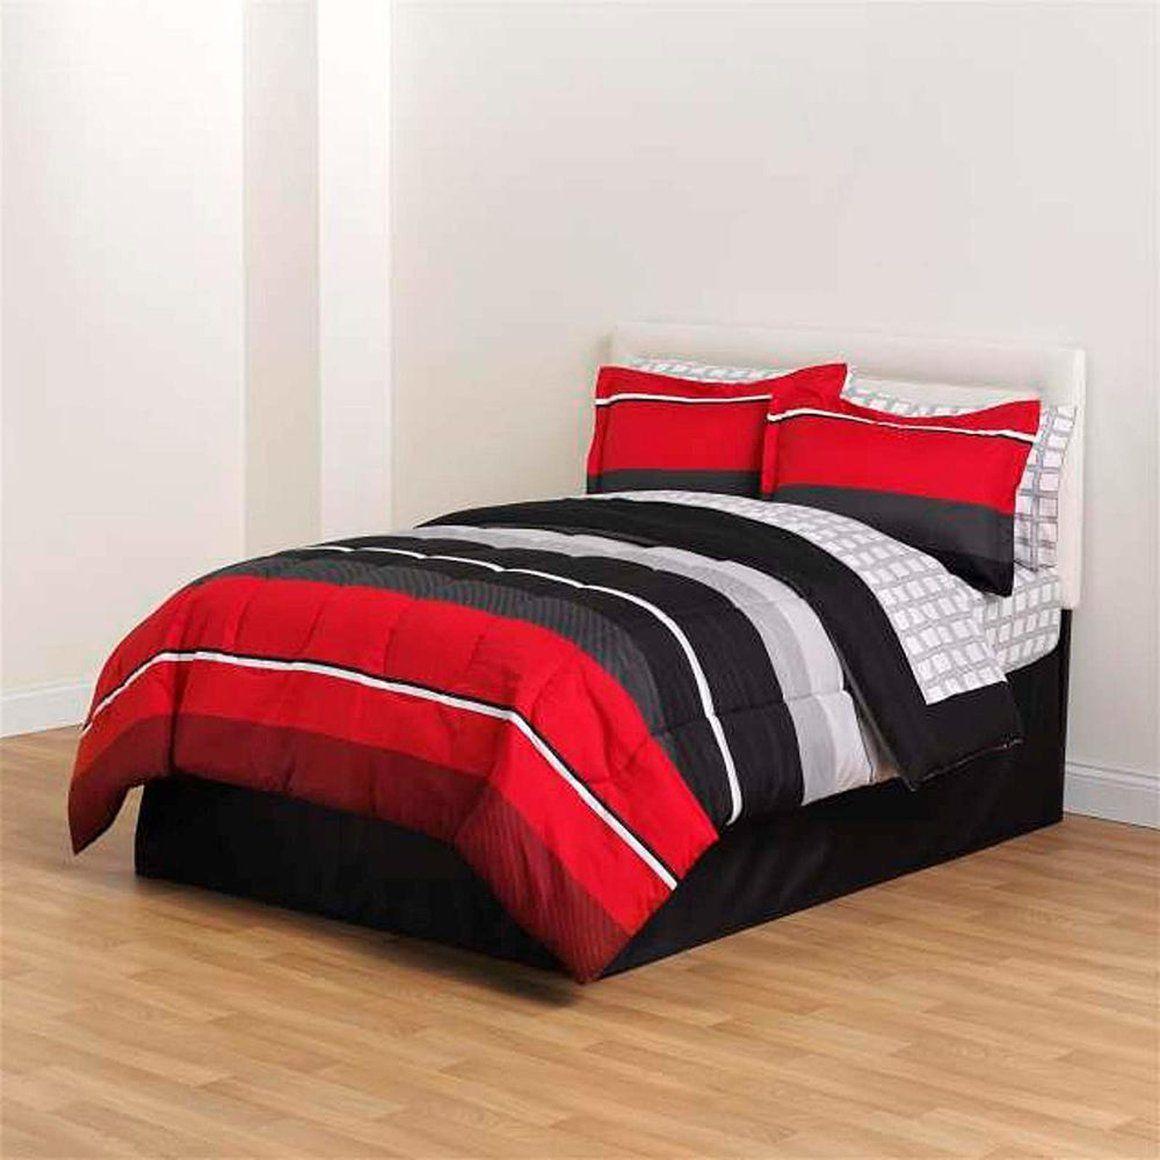 Full Comforter Set Black Red Gray White Rugby Boys Stripe Complete